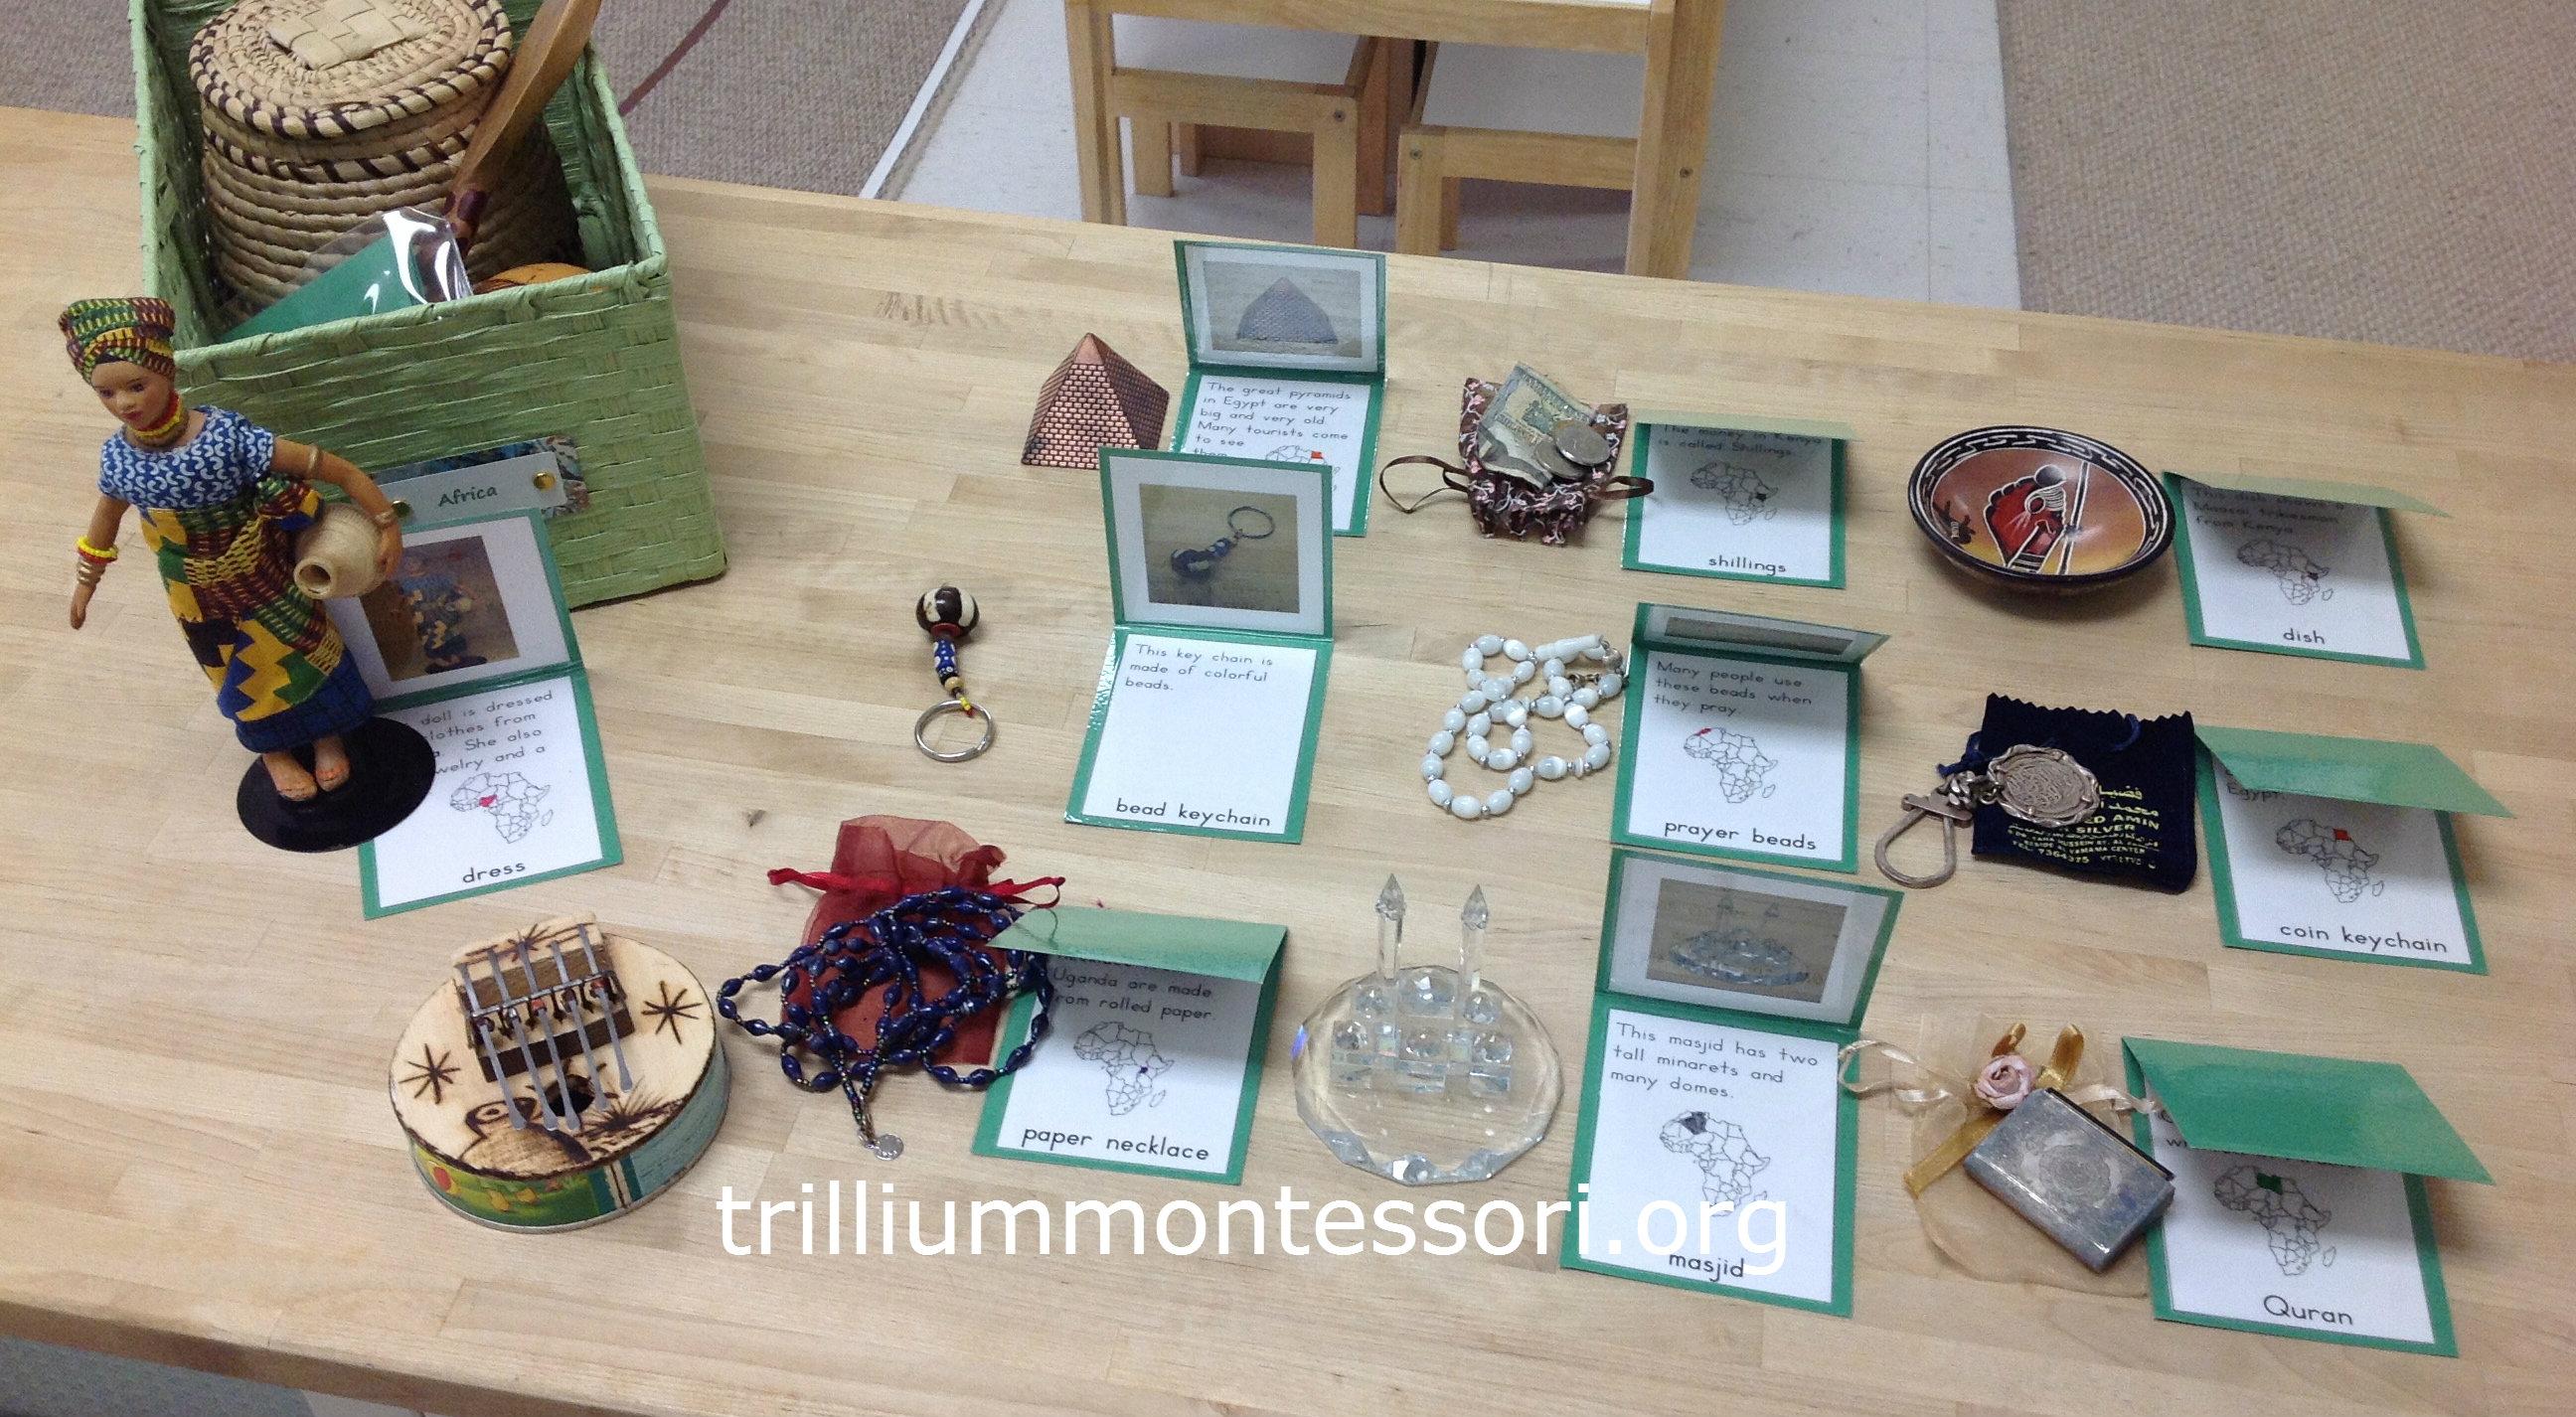 Box Culture : The continent of africa trillium montessori